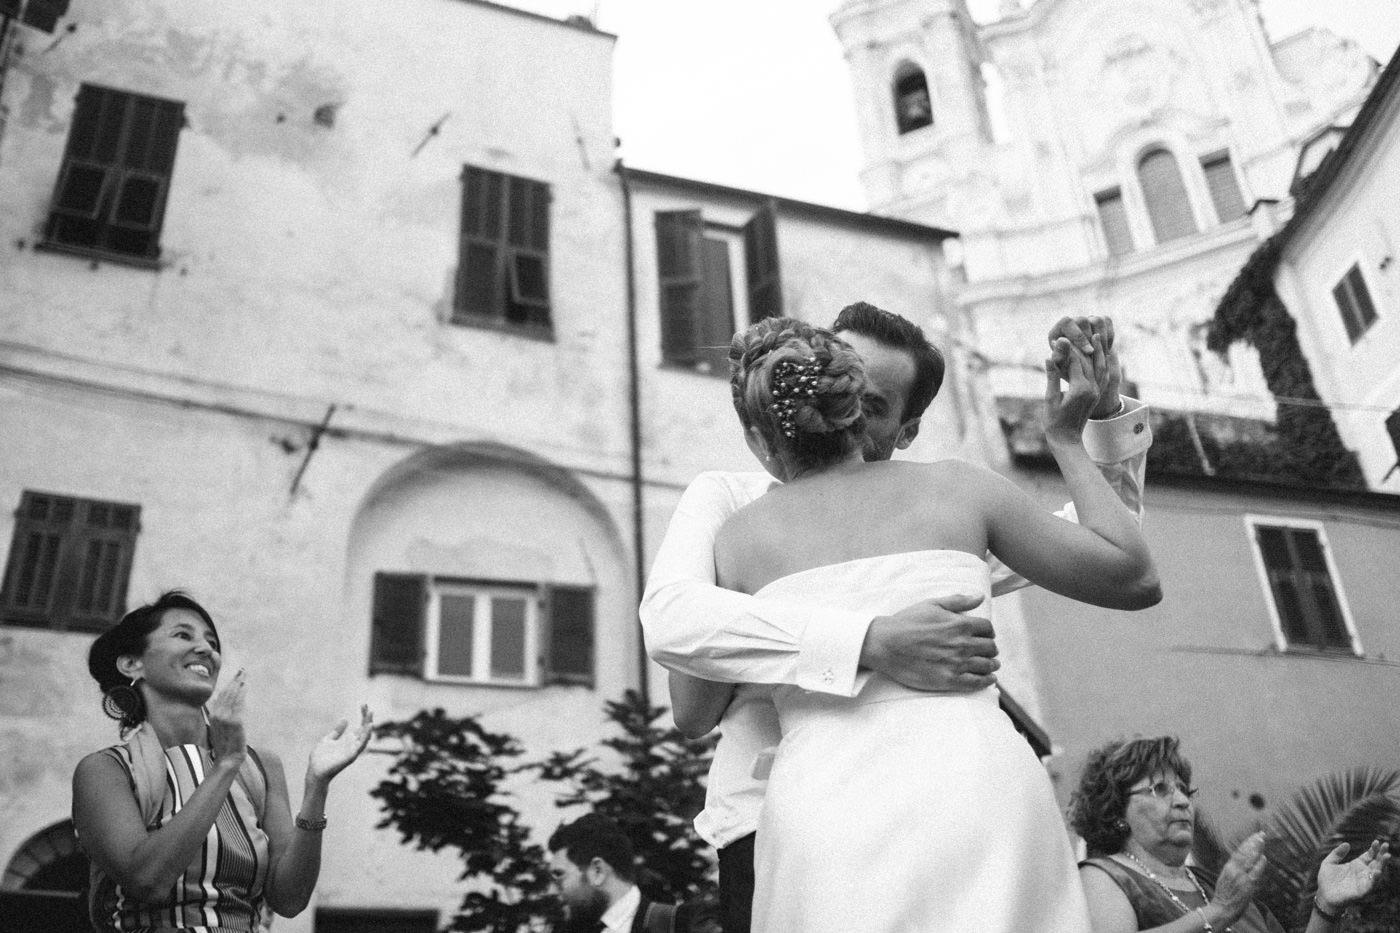 matrimoni_all_italiana_fotografo_matrimonio_cinque_terre-65.jpg